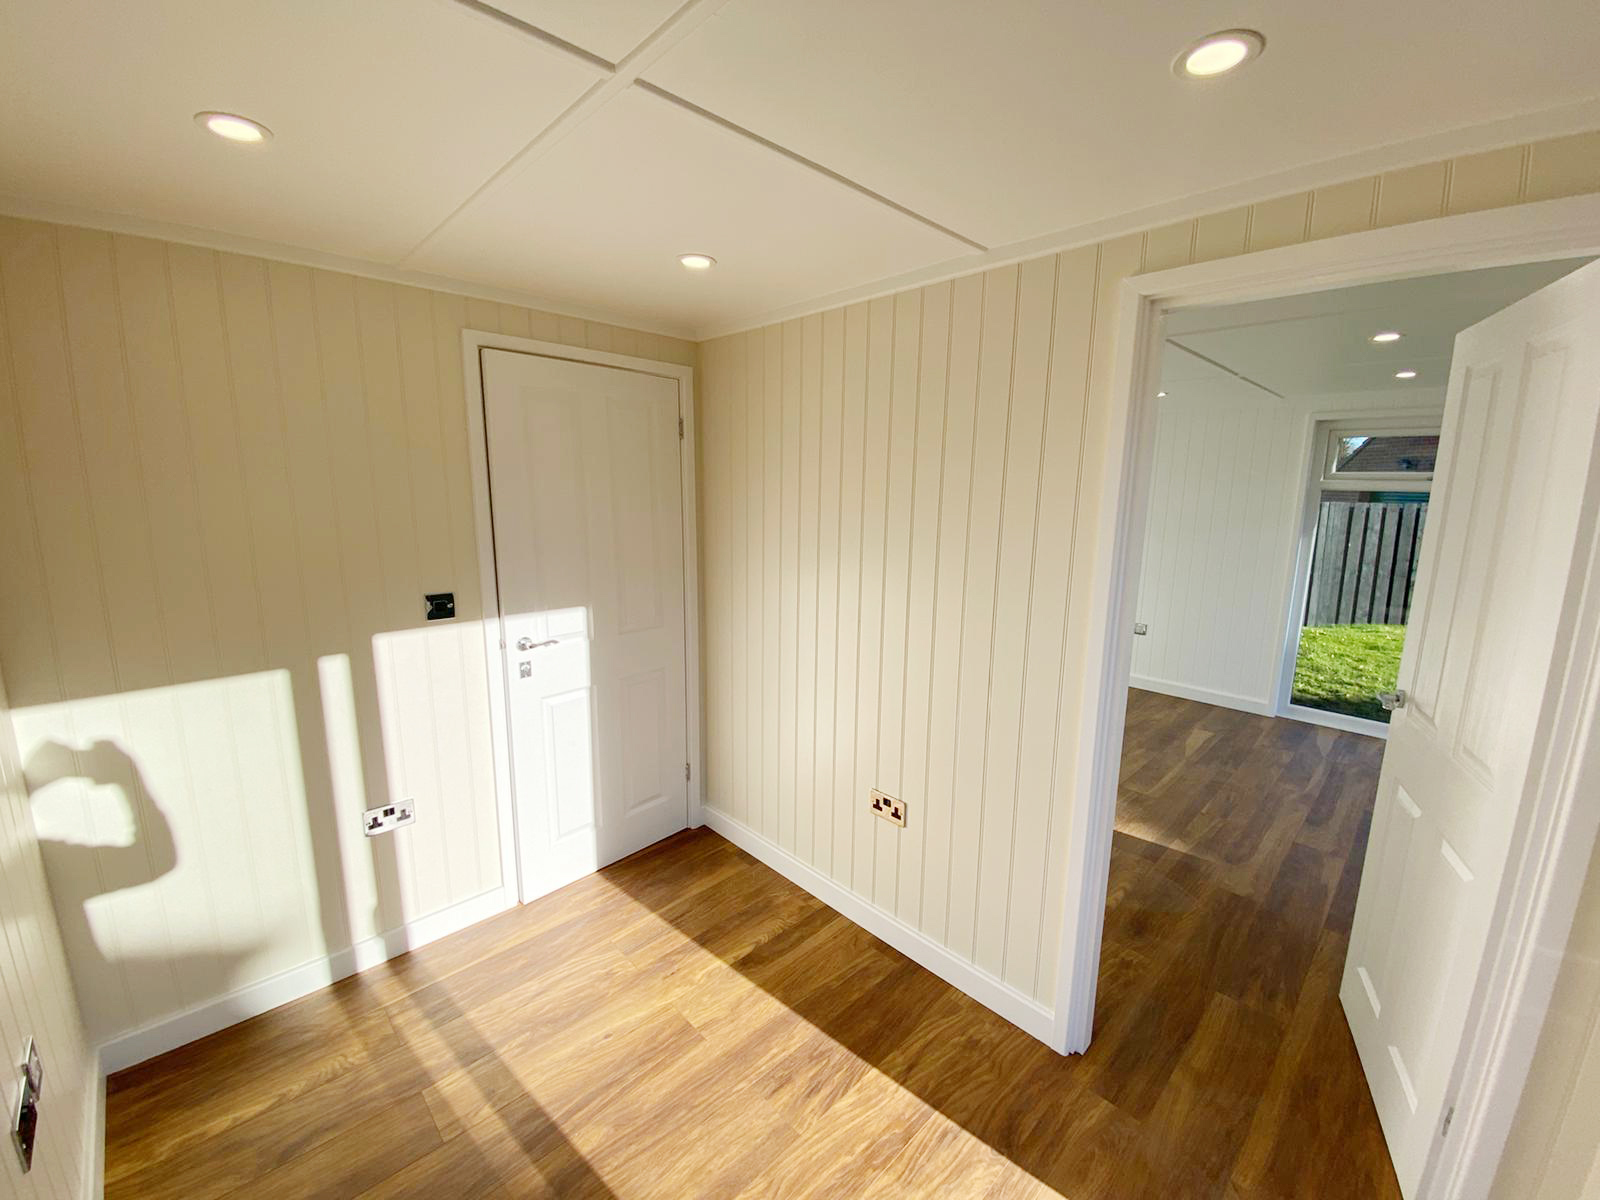 Cabin Master - Stallard  6m x 4m - Redwood - Alexs Team _04